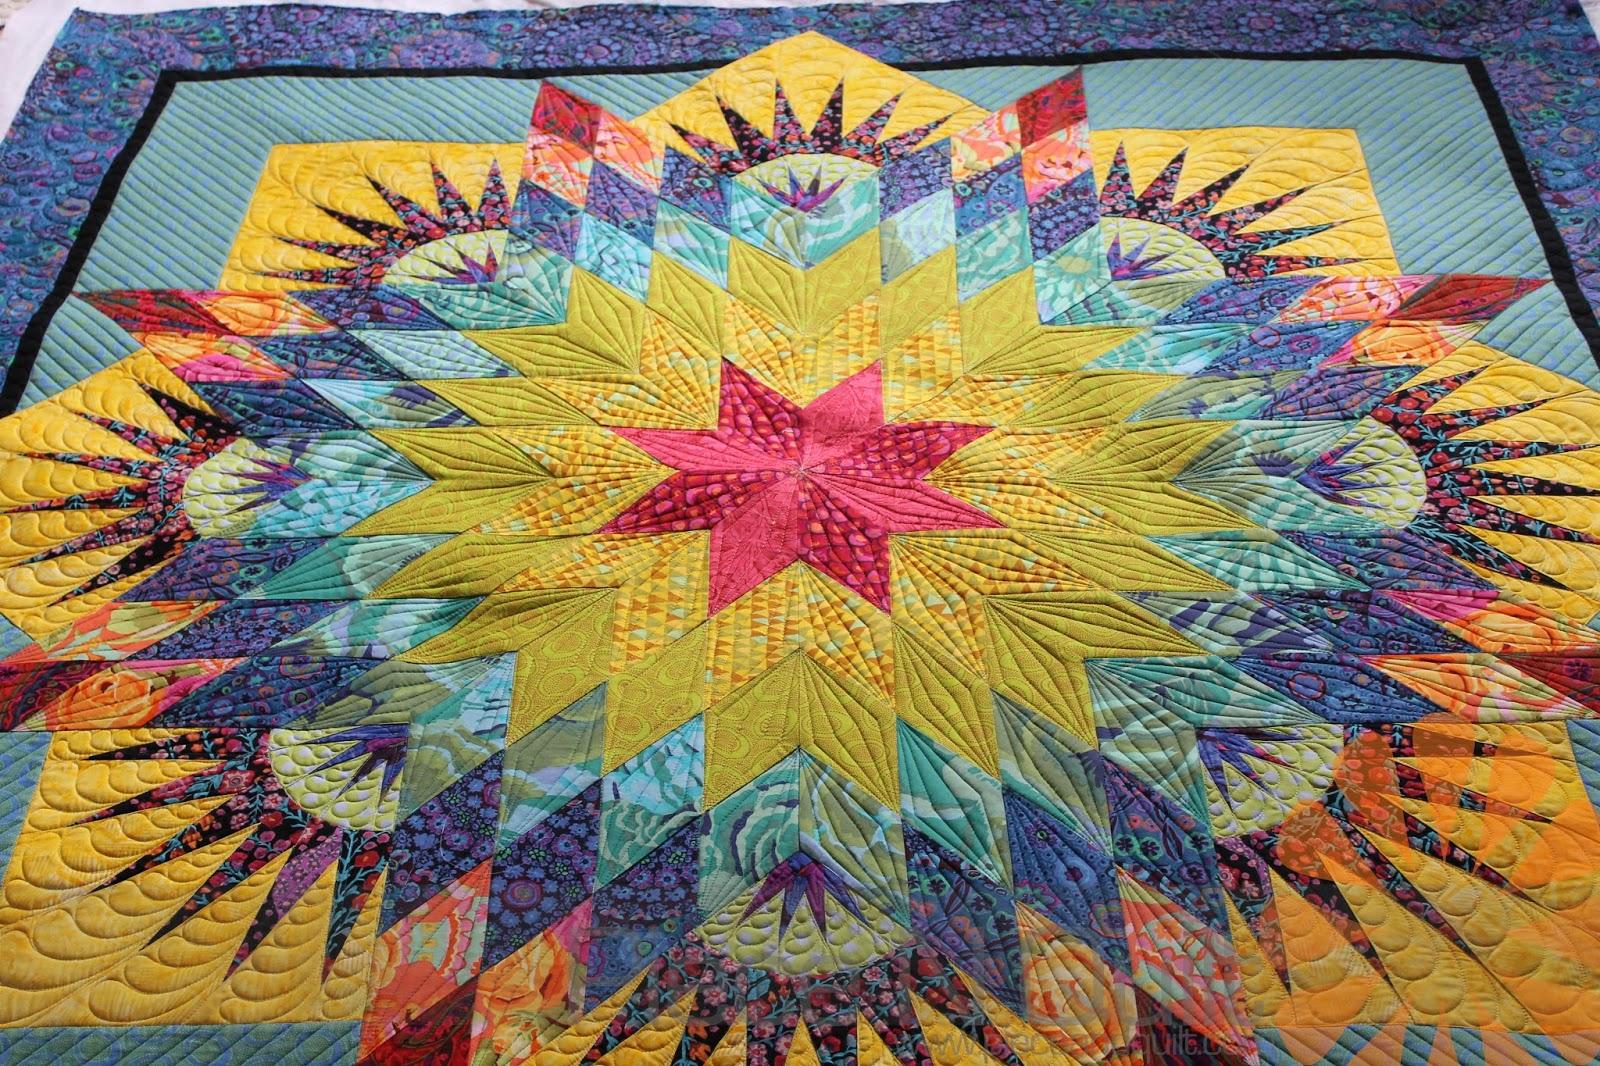 Piece N Quilt: Paper Pieced Star Quilt - Custom Machine Quilting ... : paper pieced quilts - Adamdwight.com